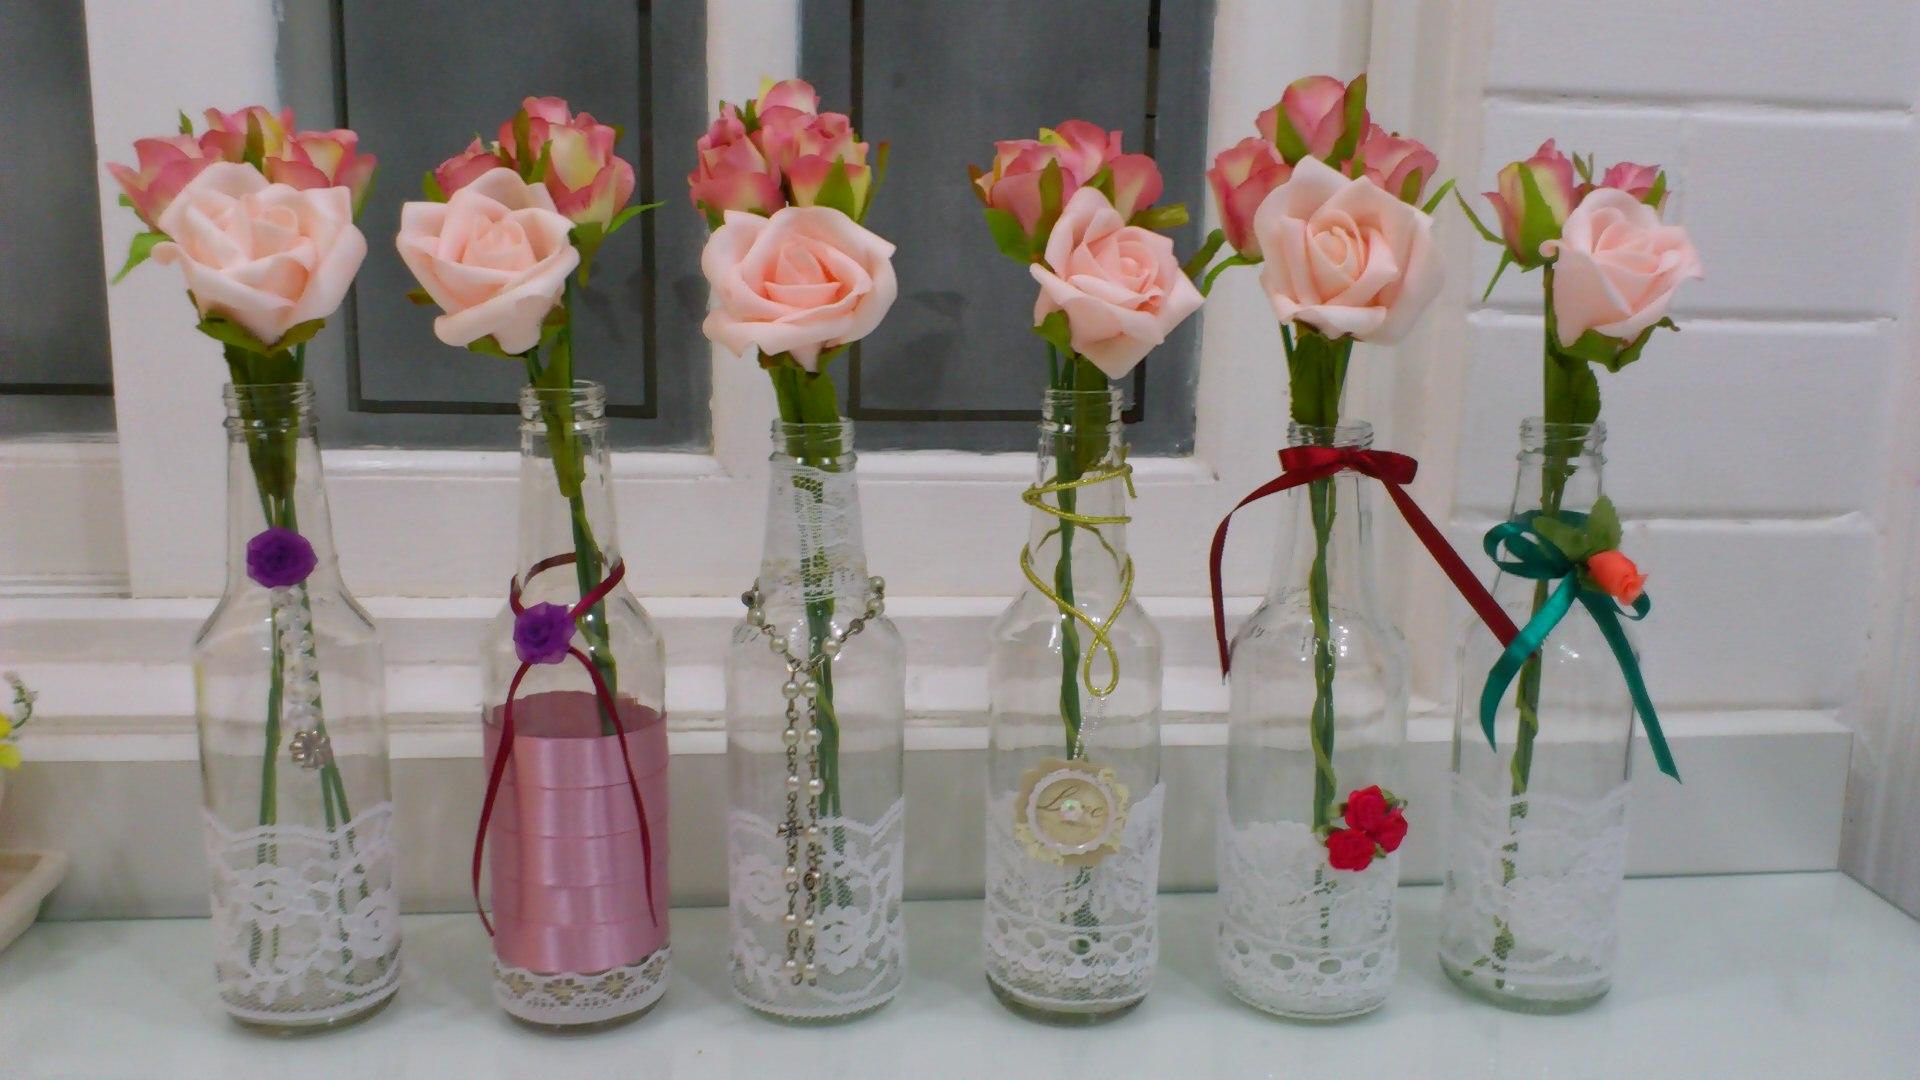 Garrafas decoradas Oficina da Lolli Elo7 #7B3B34 1920x1080